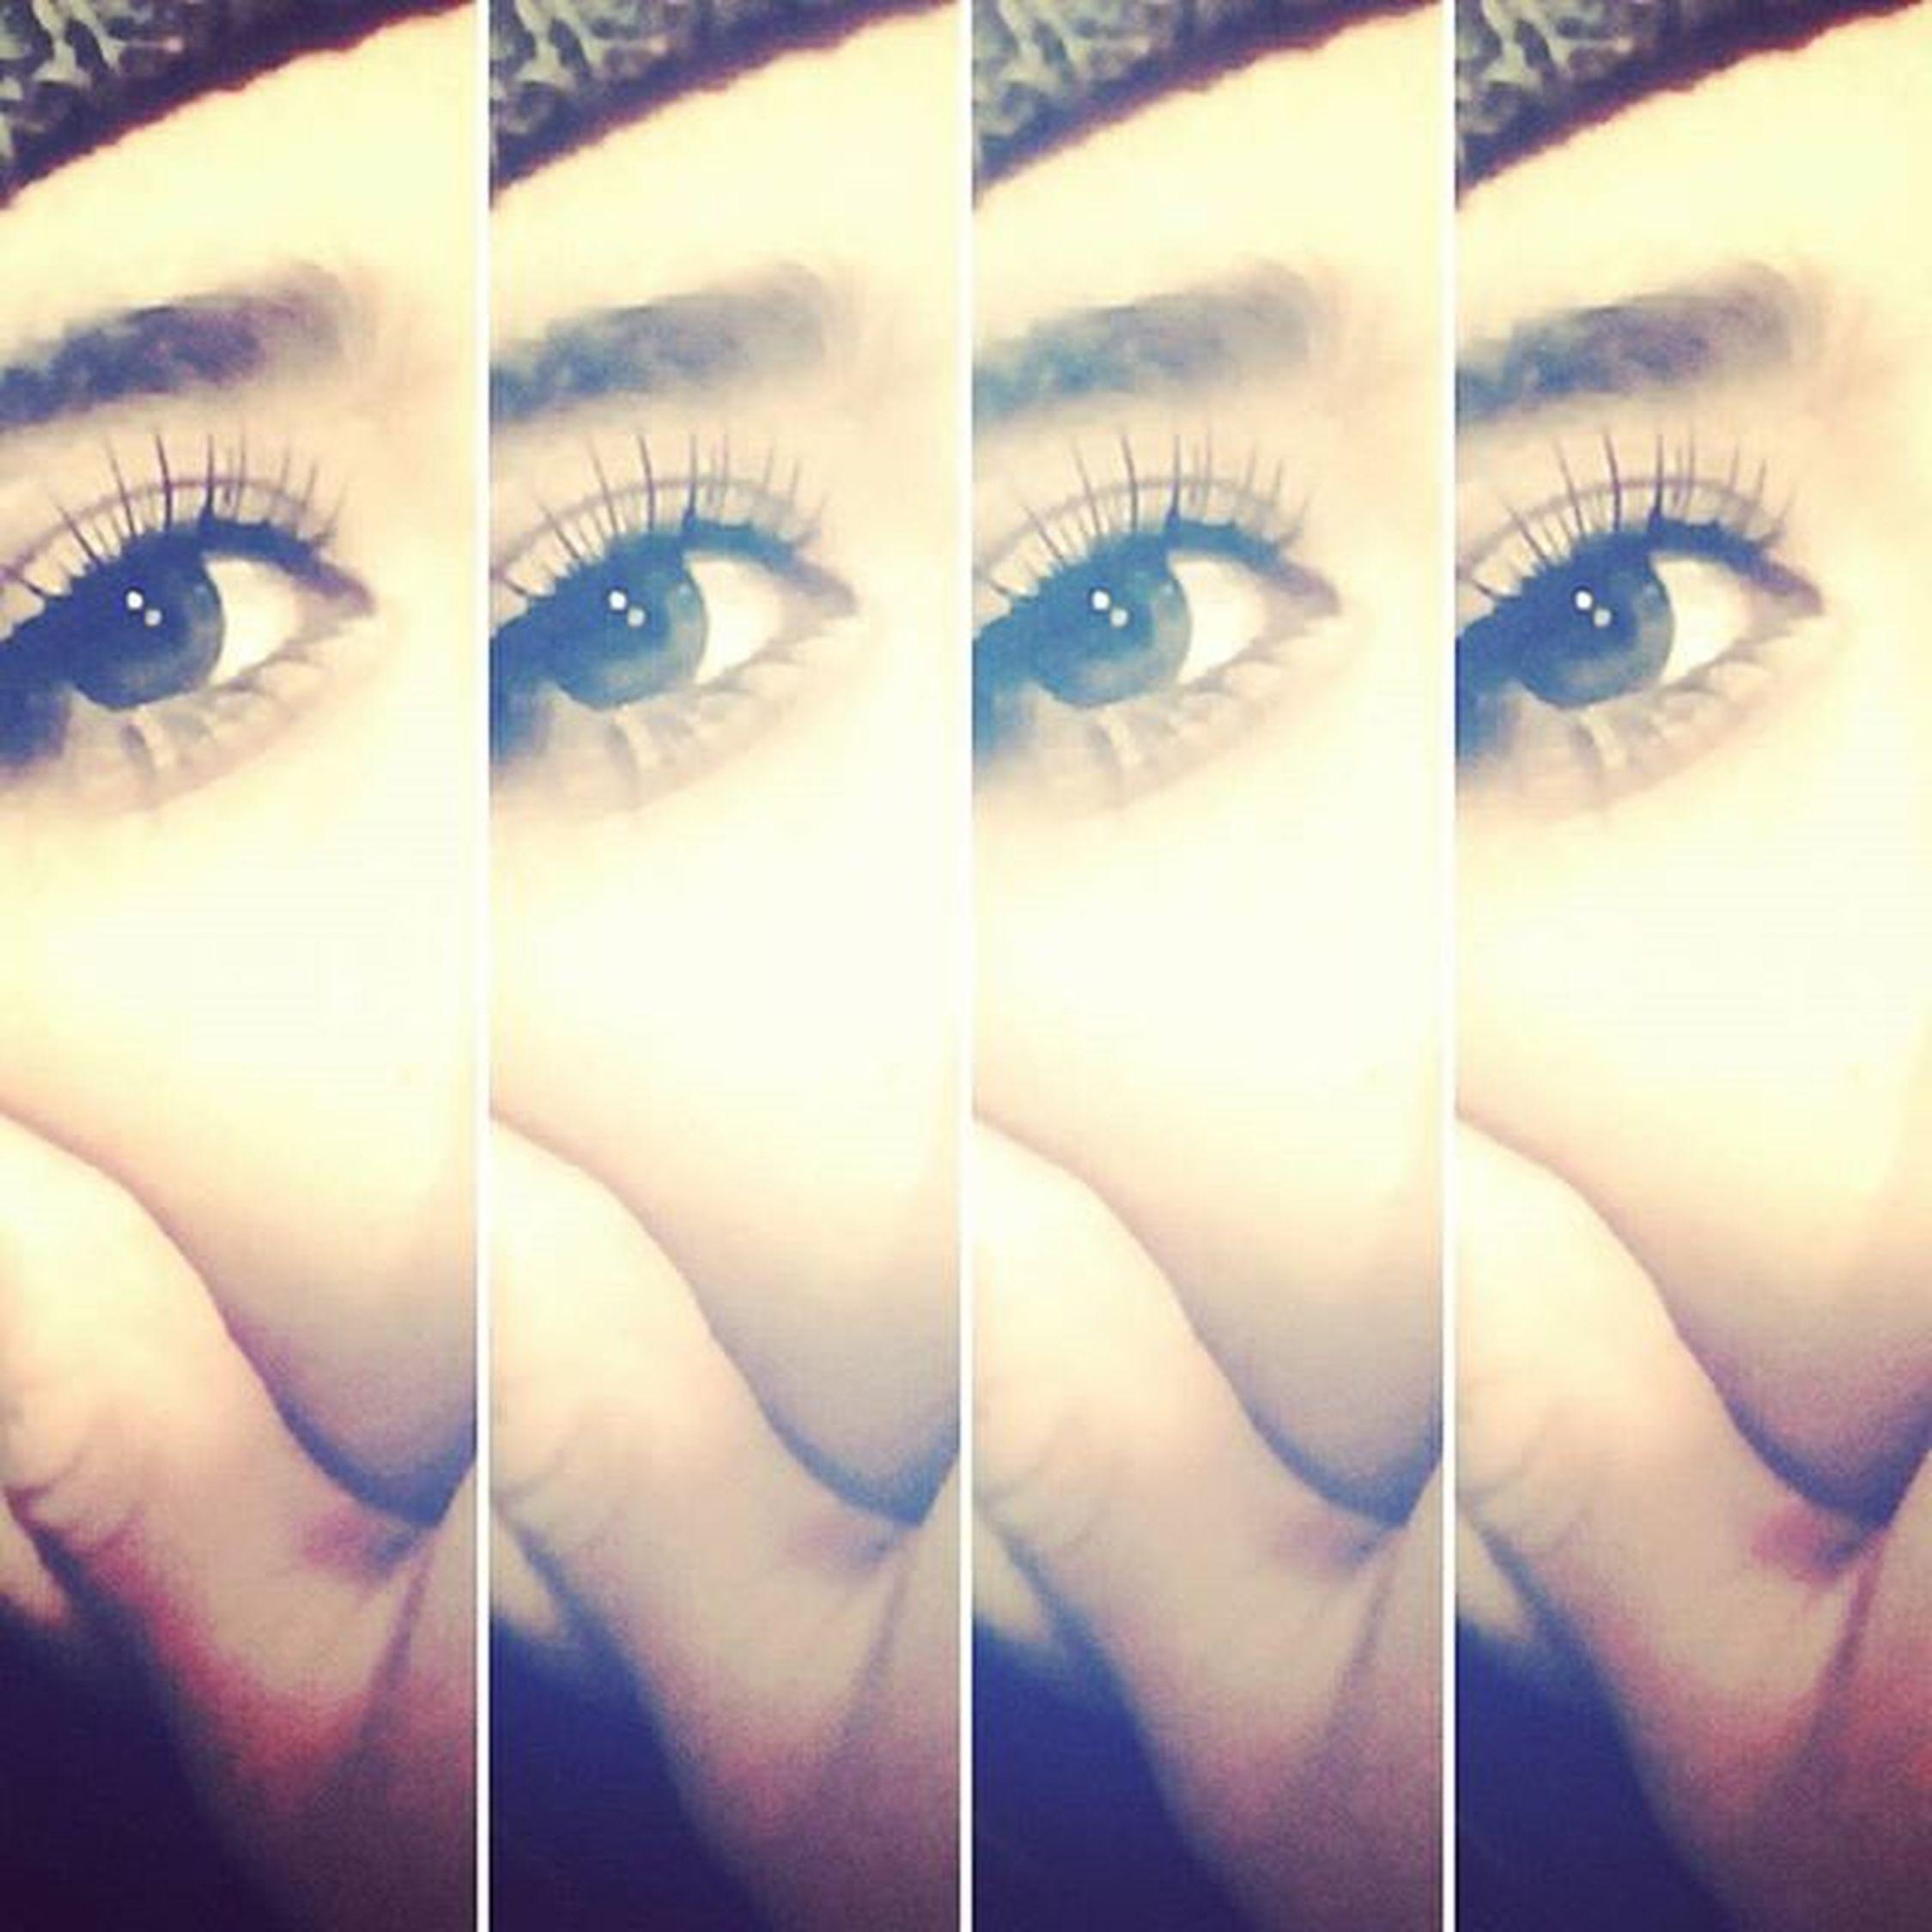 Eyes 💙❤ Justinbieber Onedirection Unicos Hashtags Arianagrande Selenagomez Indie Russiangirl Modeling Feliz Perfect Bestoftheday Likeforlike Followbackteam Holyshit Skynappers Beauty Polishgirl Mexicanmodel Back Pleaselike